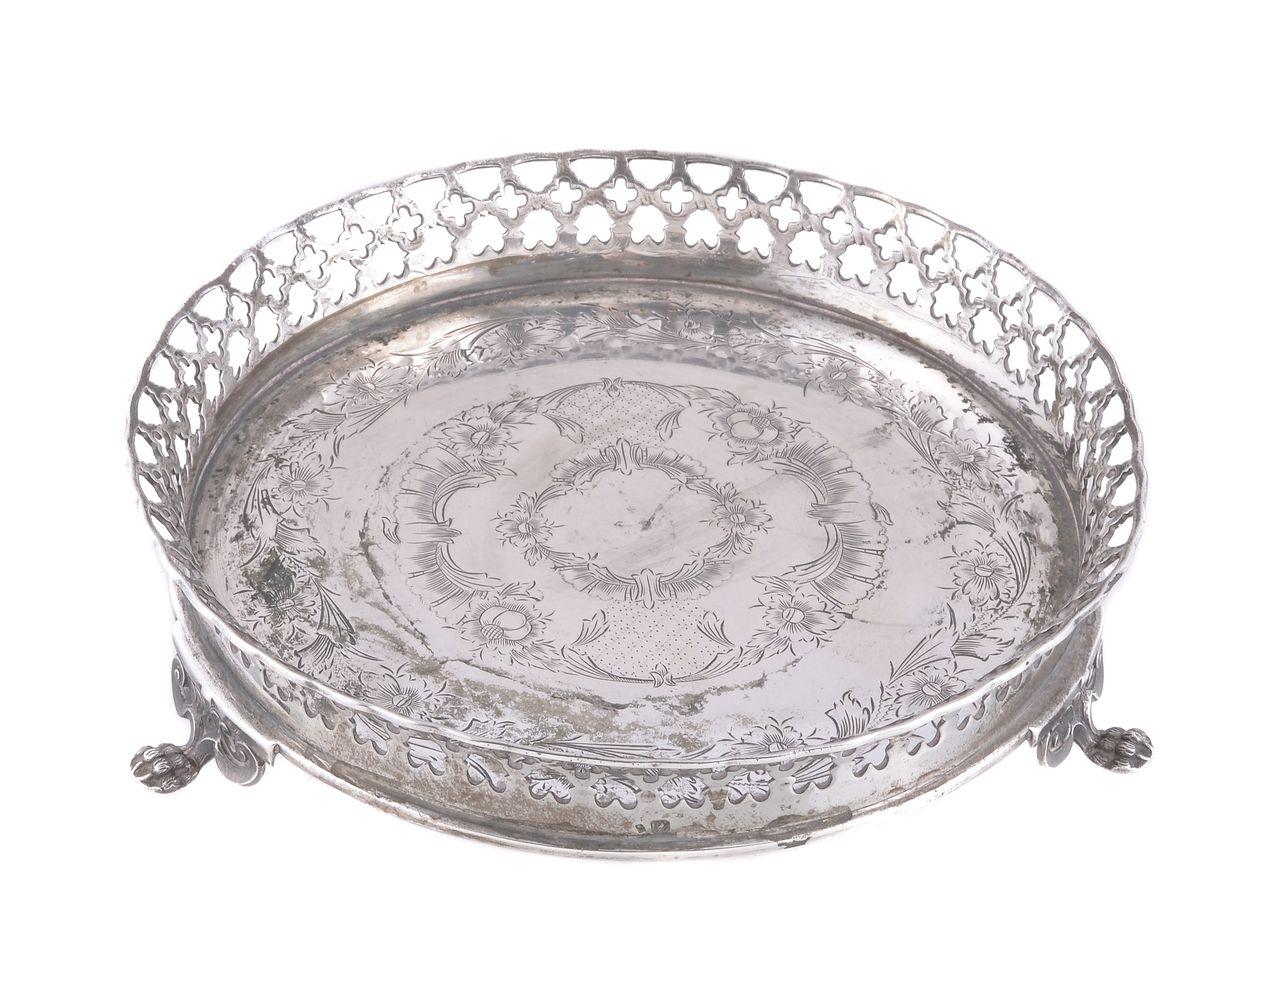 A Portuguese silver circular galleried stand